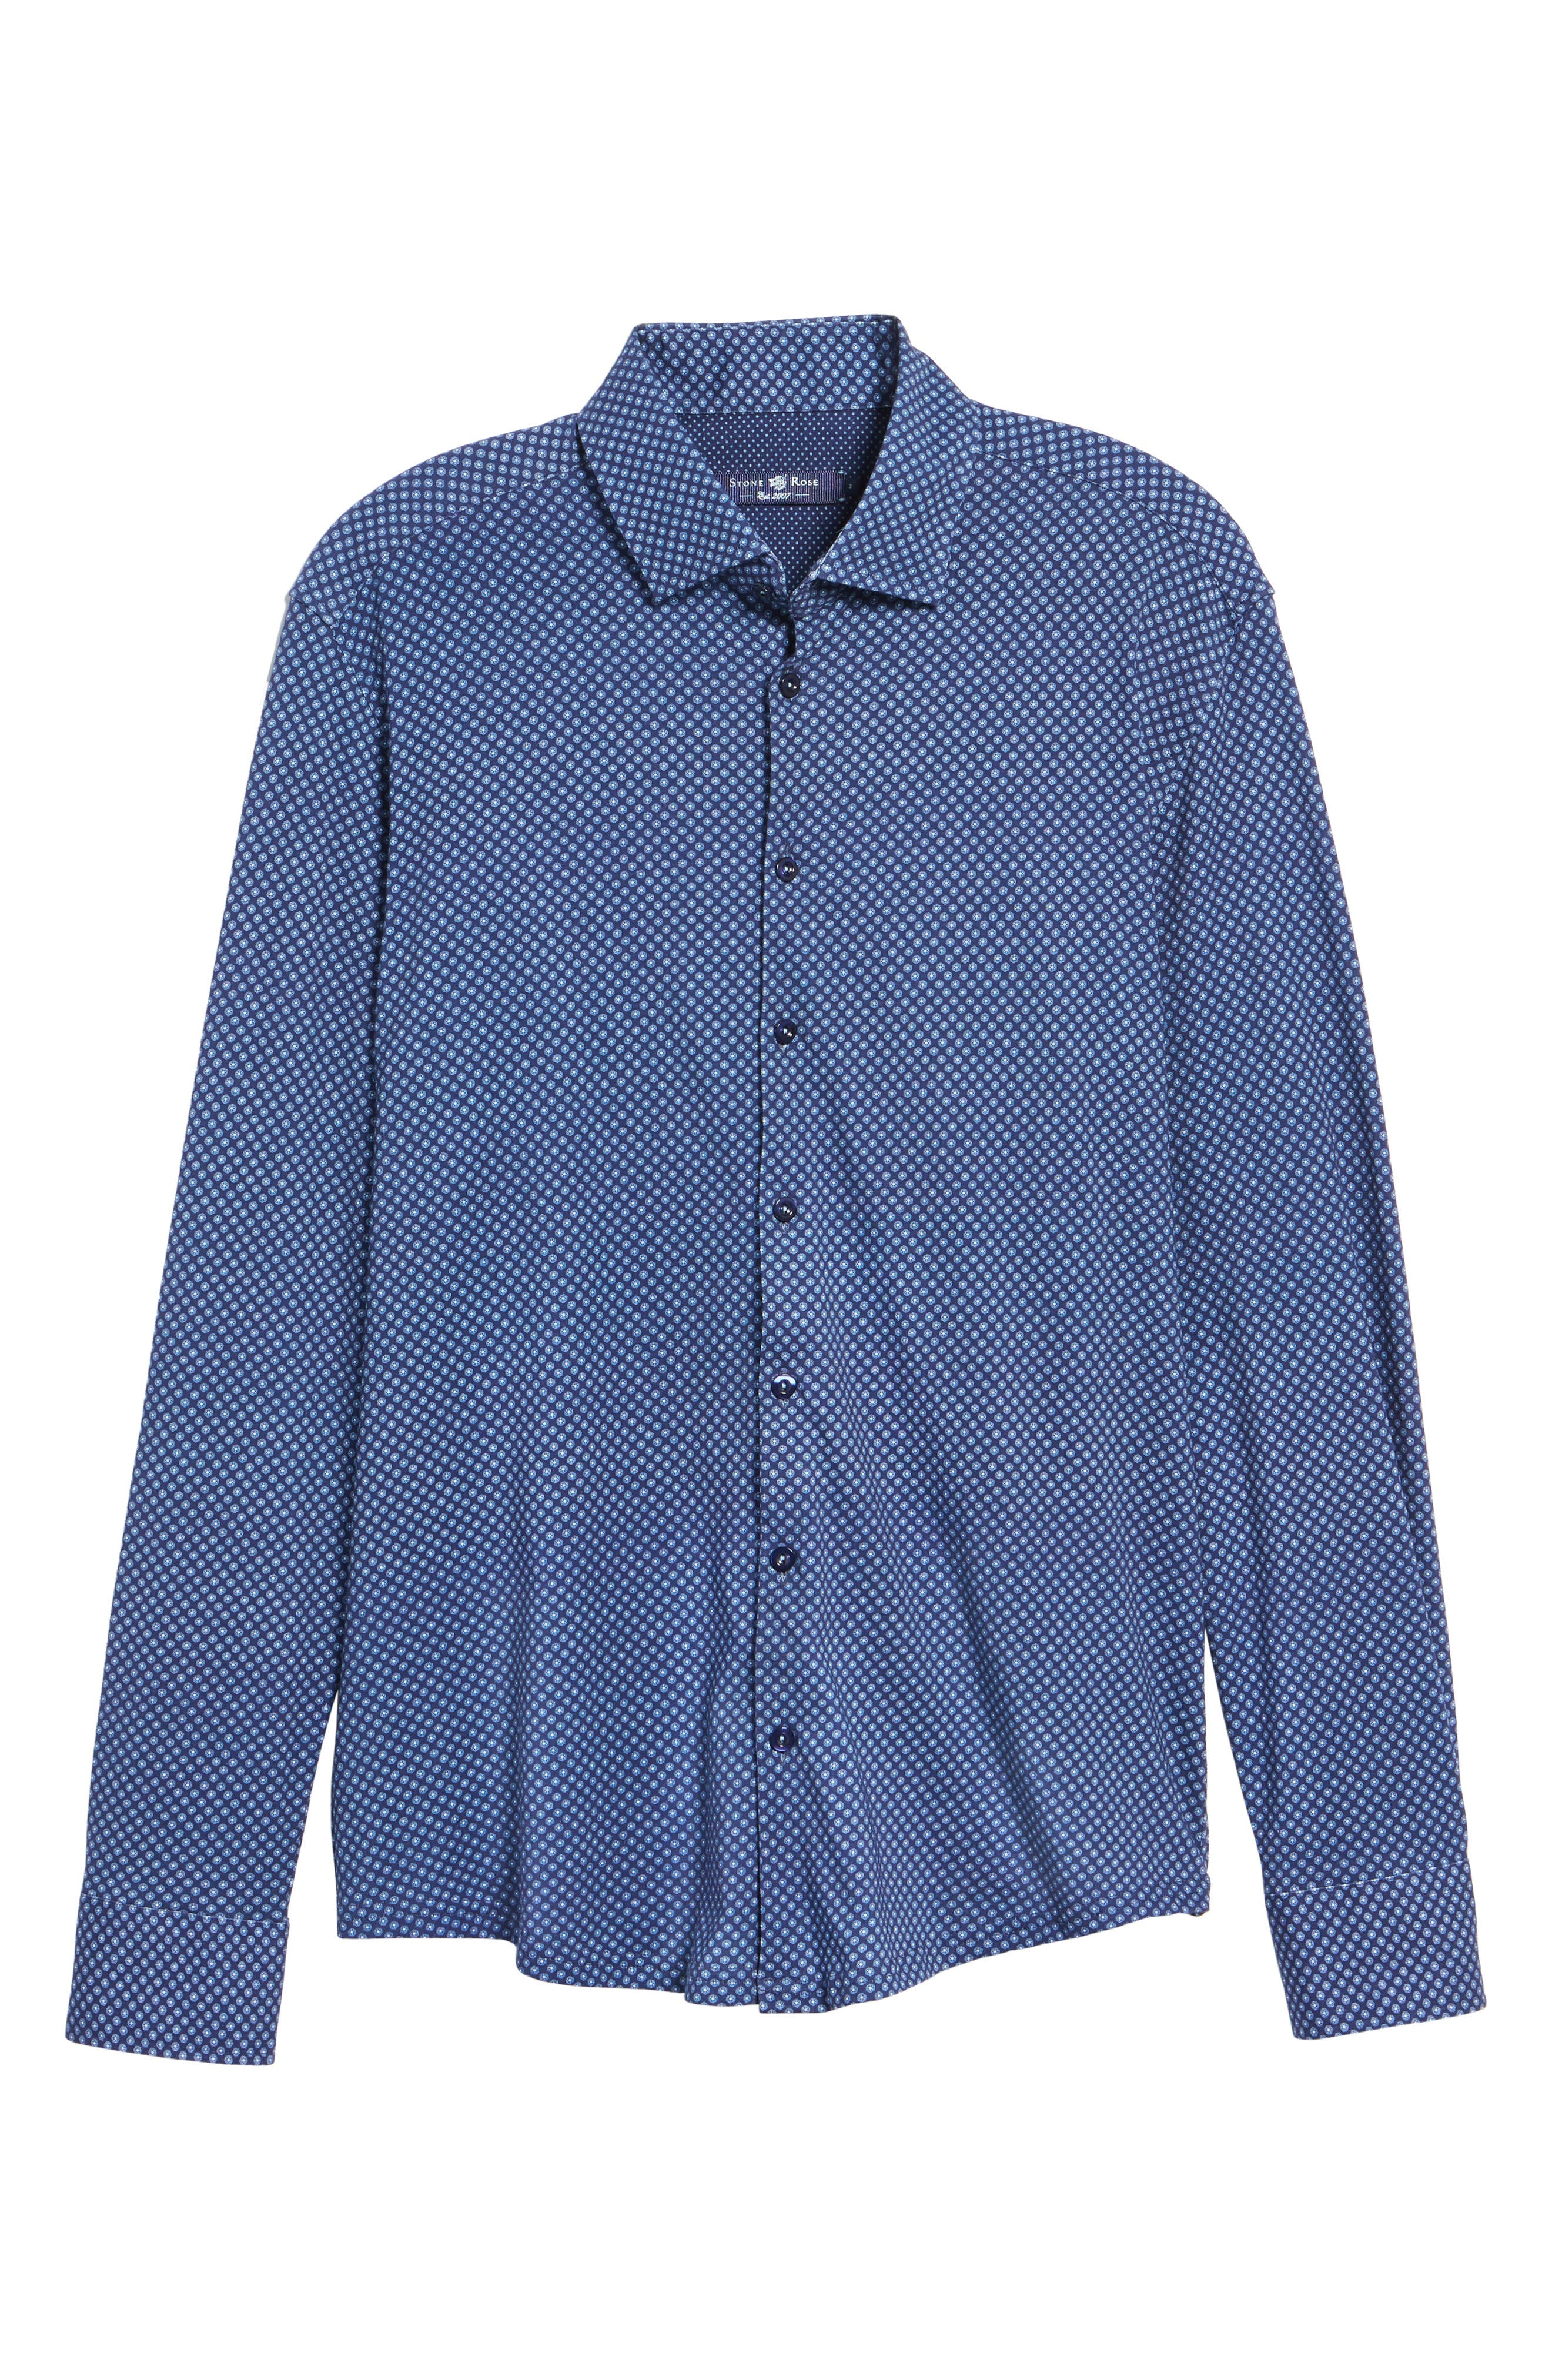 Floral Geo Print Knit Sport Shirt,                             Alternate thumbnail 6, color,                             Navy